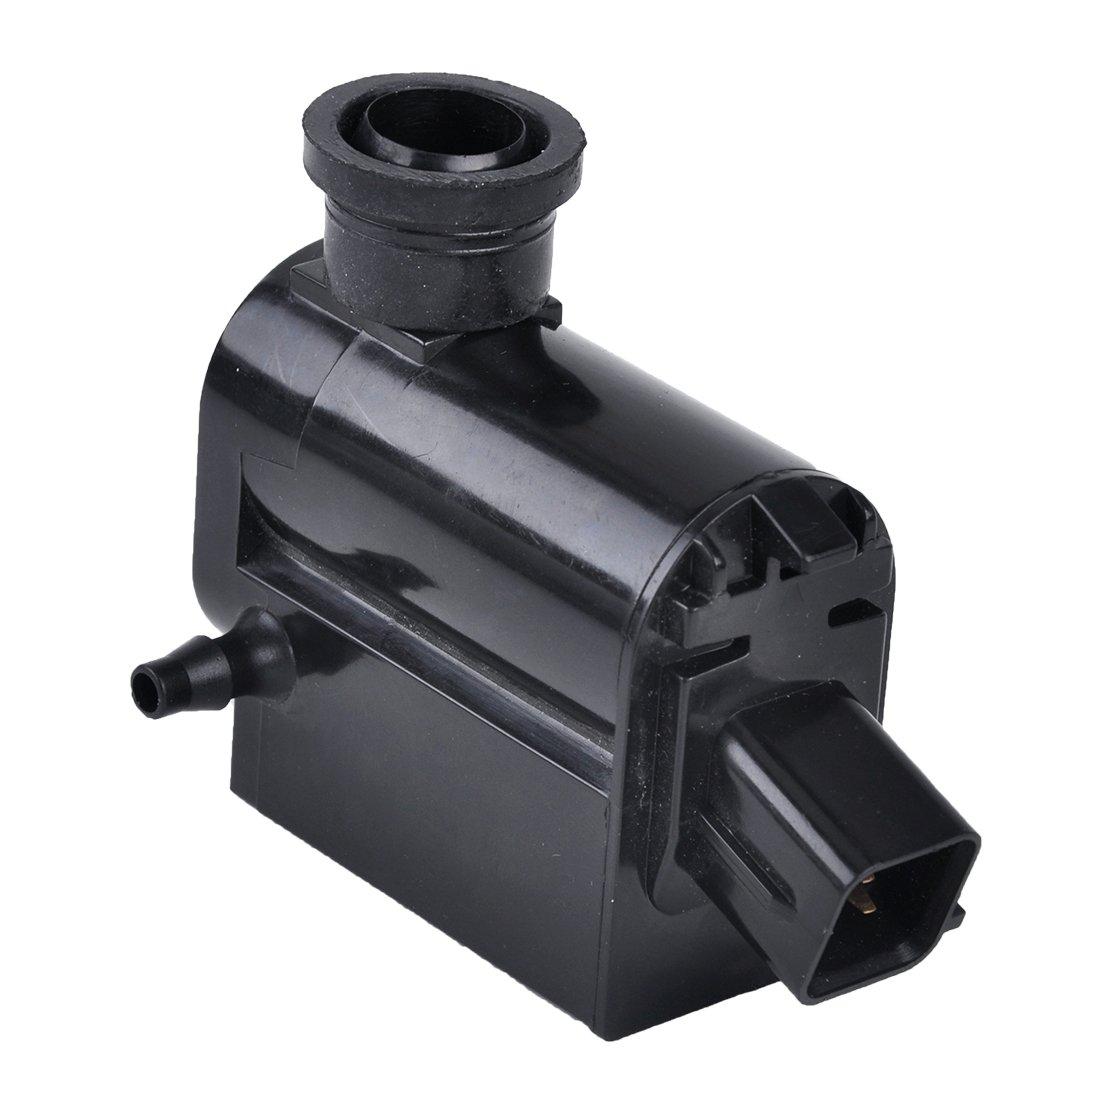 beler Auto Windschutzscheibe Waschwasserpumpe 9851026100/985101/C100